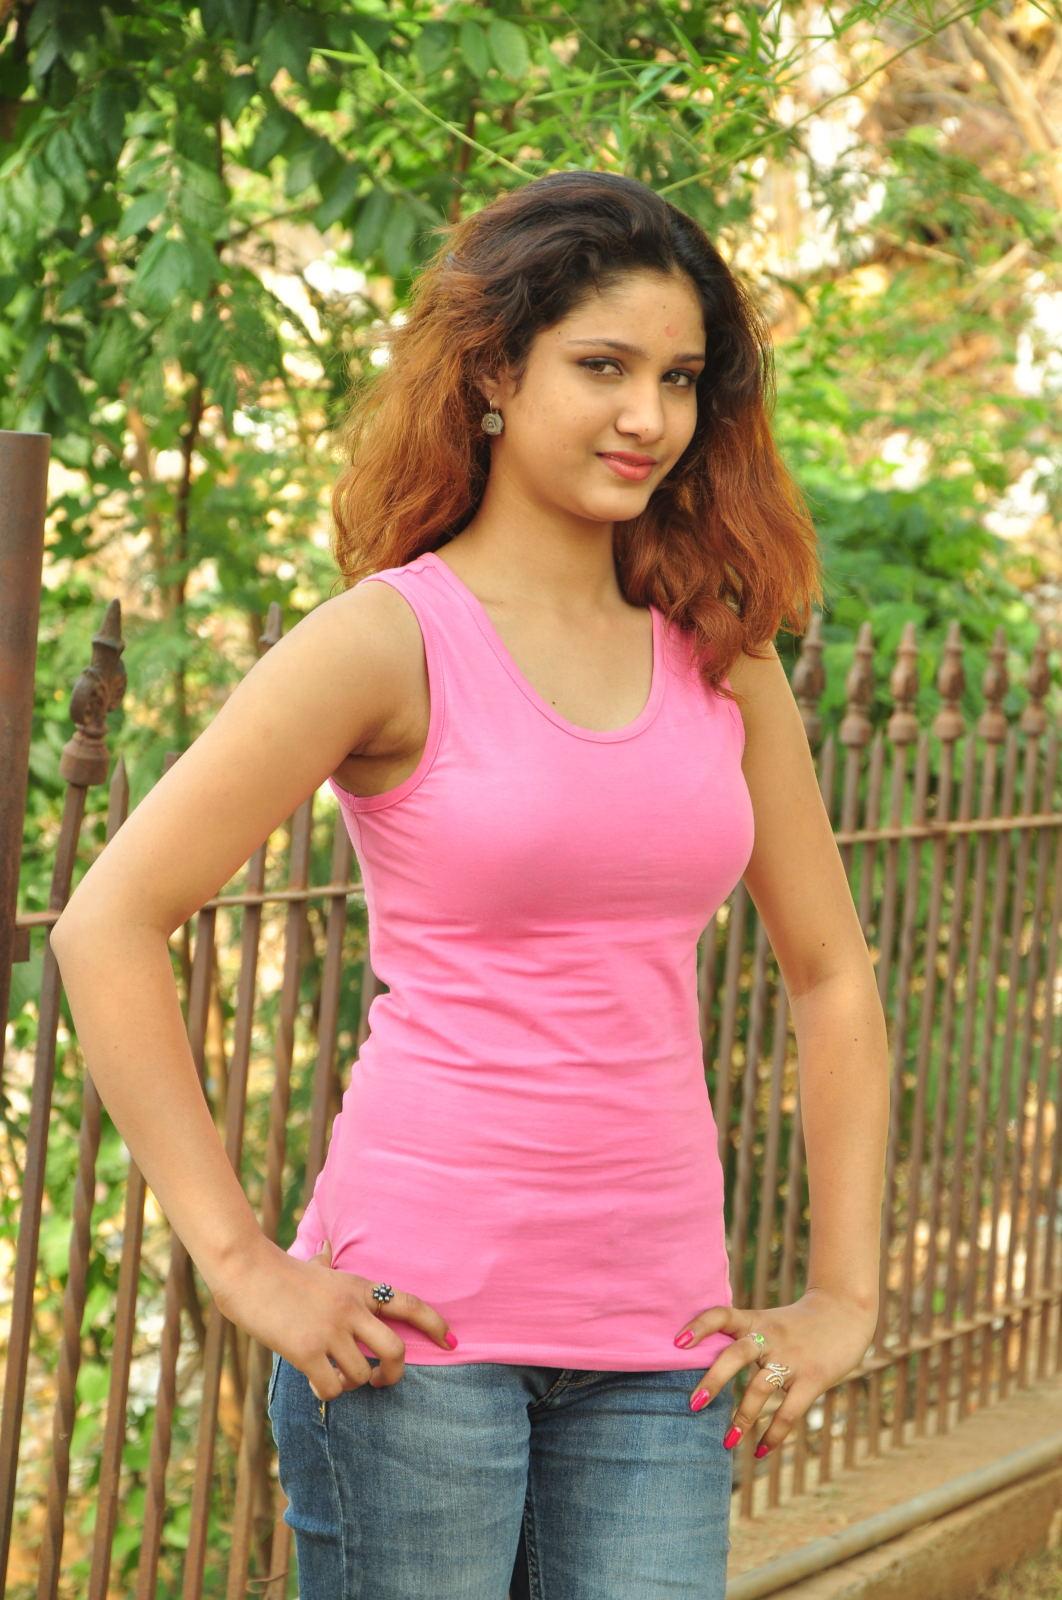 Aarthi glamorous photo gallery-HQ-Photo-10